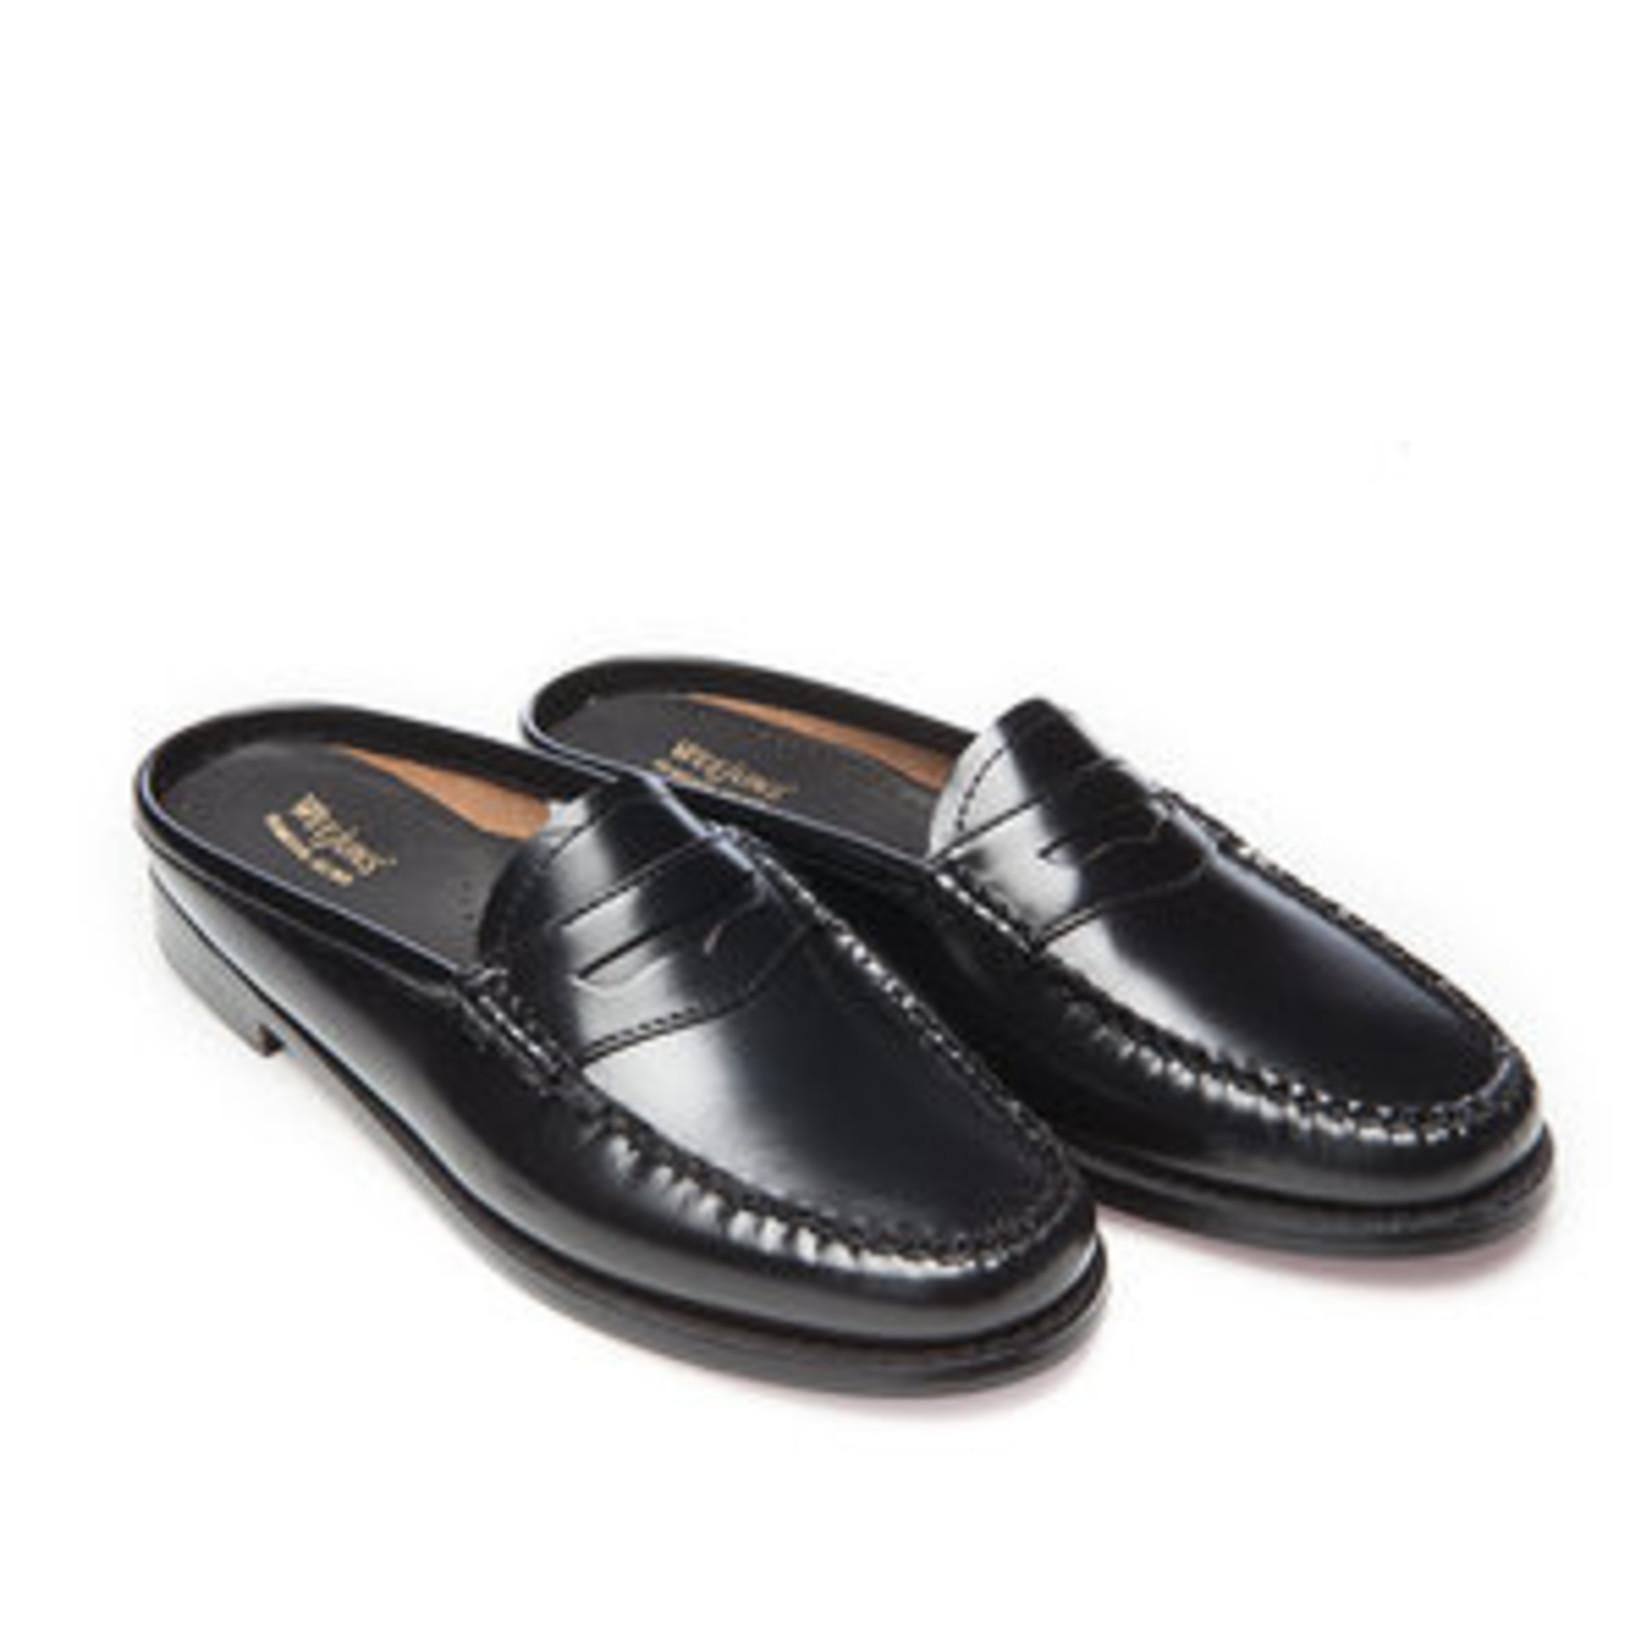 GhBass Weejuns Slide loafer